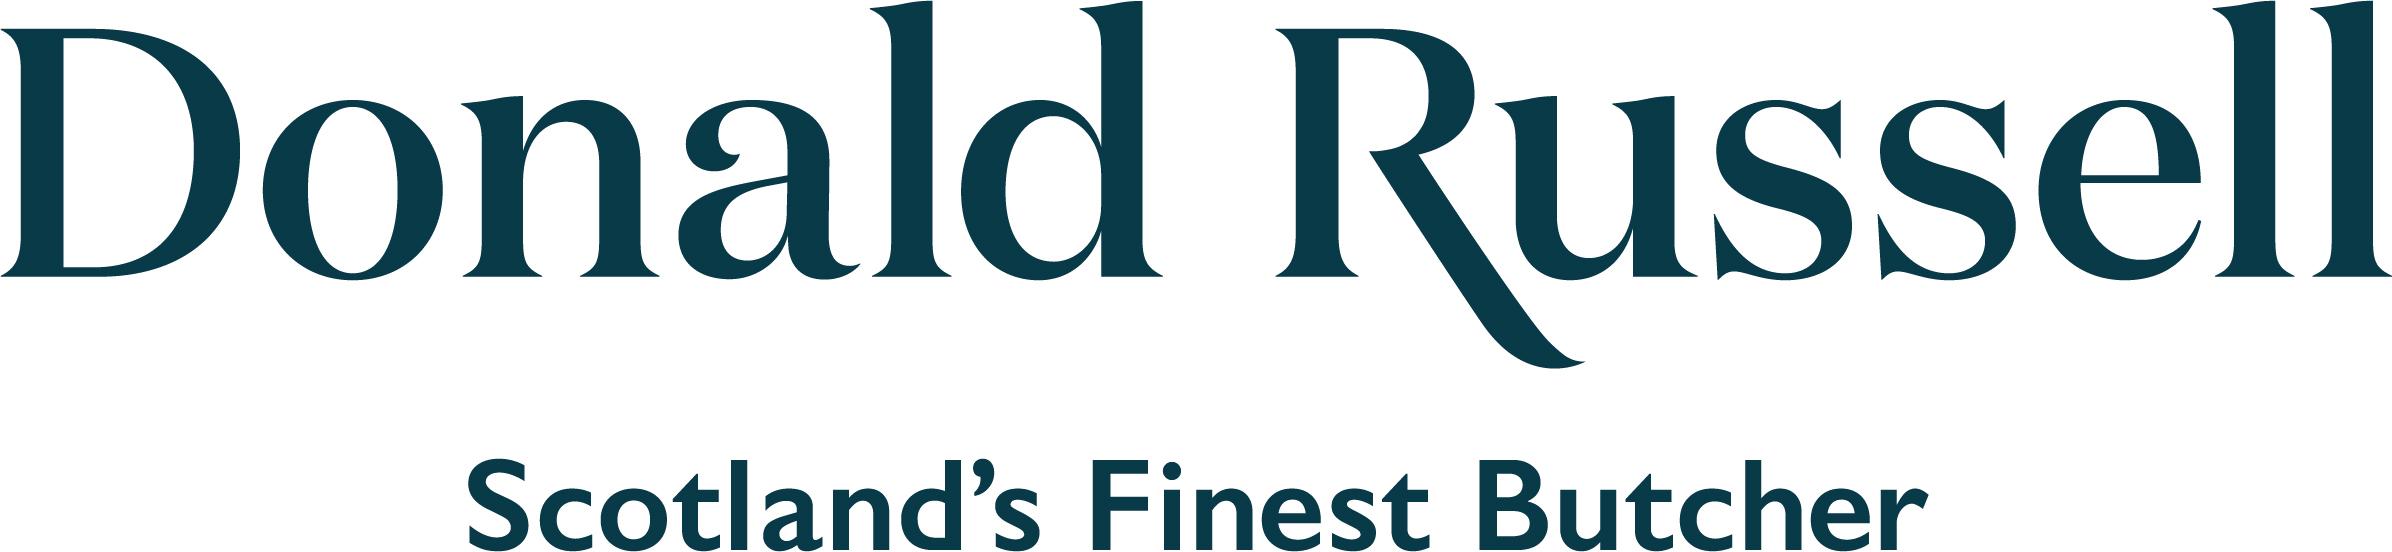 donaldrussell-uk-logo